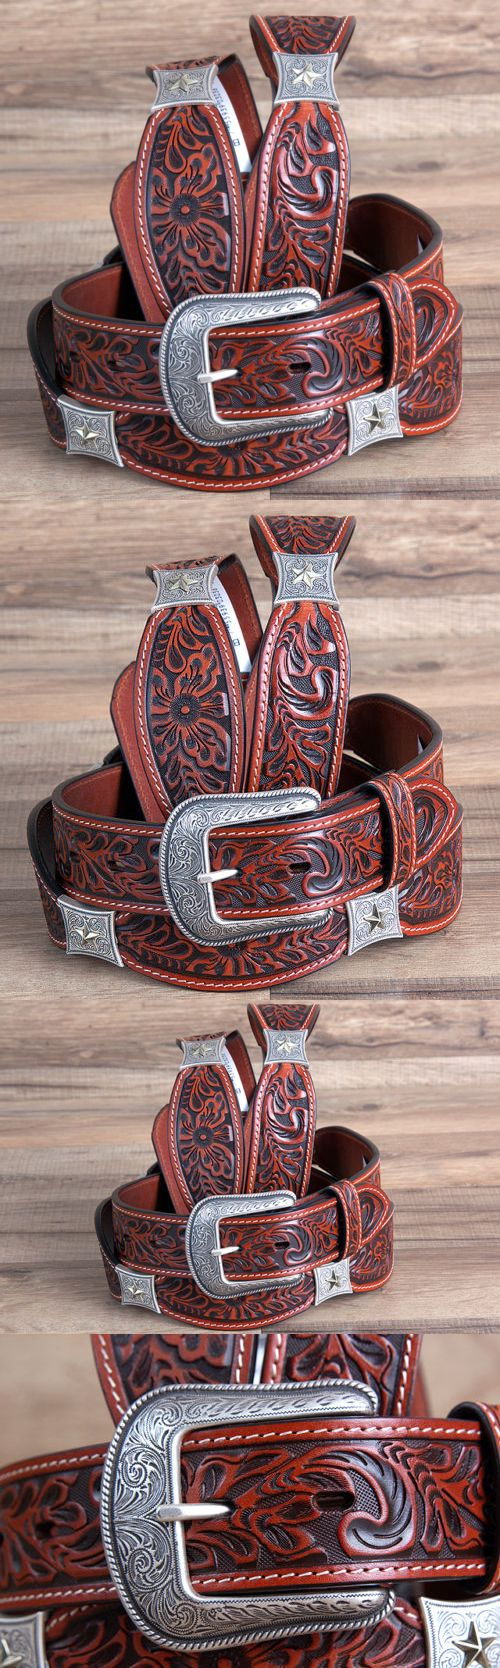 Baseball Belts 181334: 34 3D 1 3 4 Cognac Brown Floral Leather Mens Cowboy Western Fashion Belt -> BUY IT NOW ONLY: $54.99 on eBay!